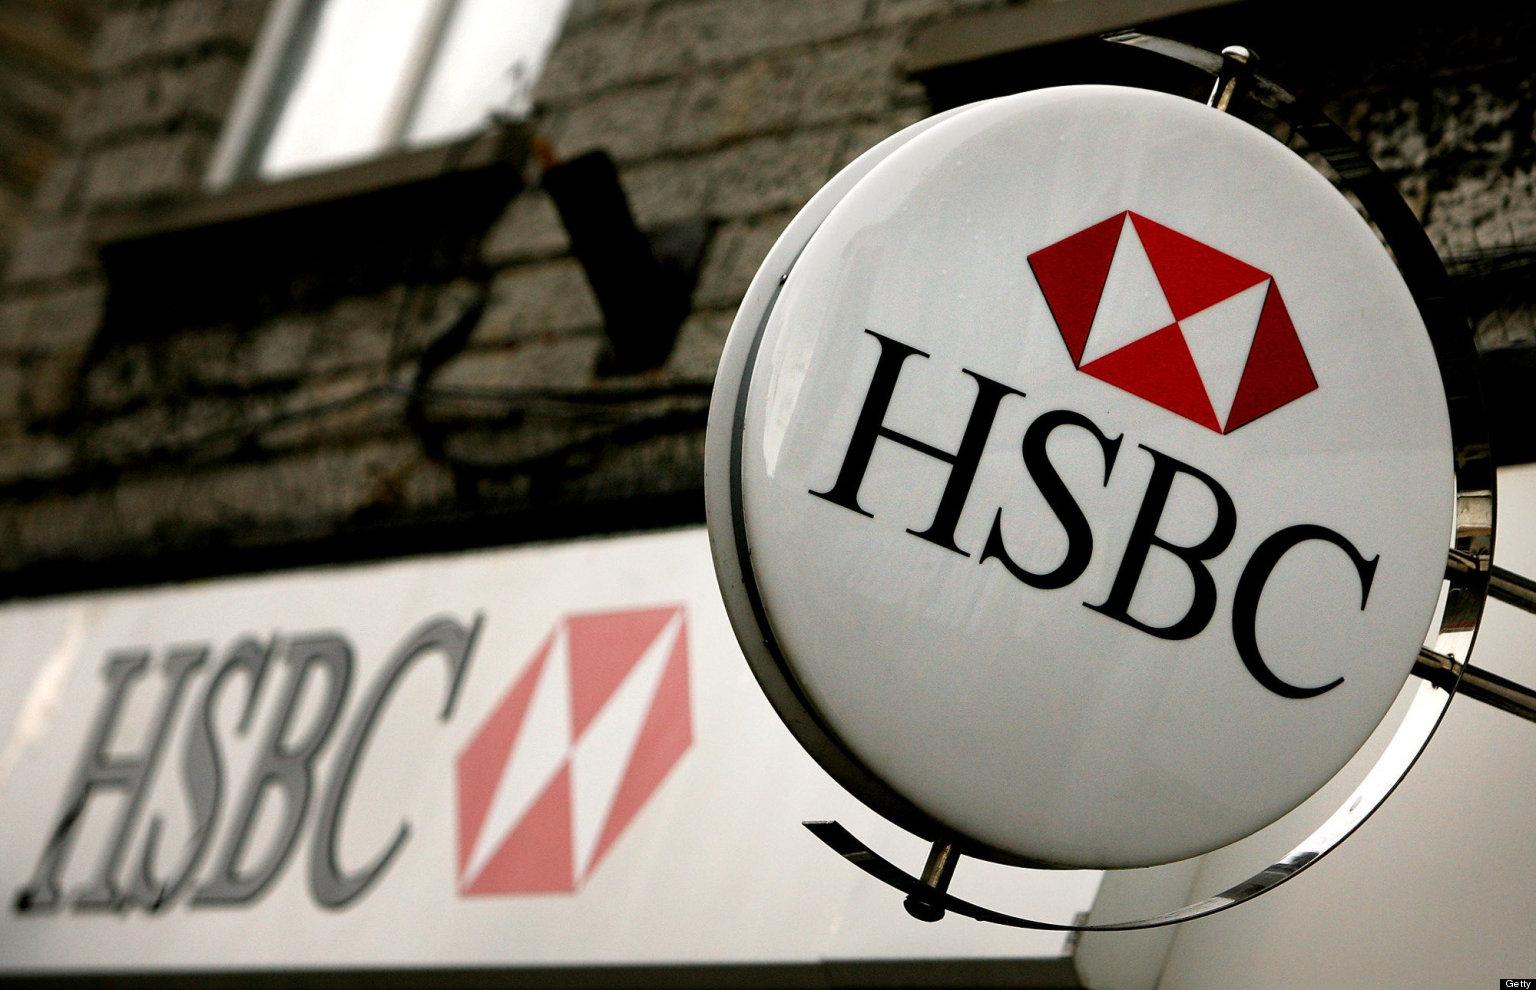 HSBC Հայաստանը նոր ղեկավար ունի՝ Փոլ Էդգարը փոխարինել է Թիես Քլեմենցին